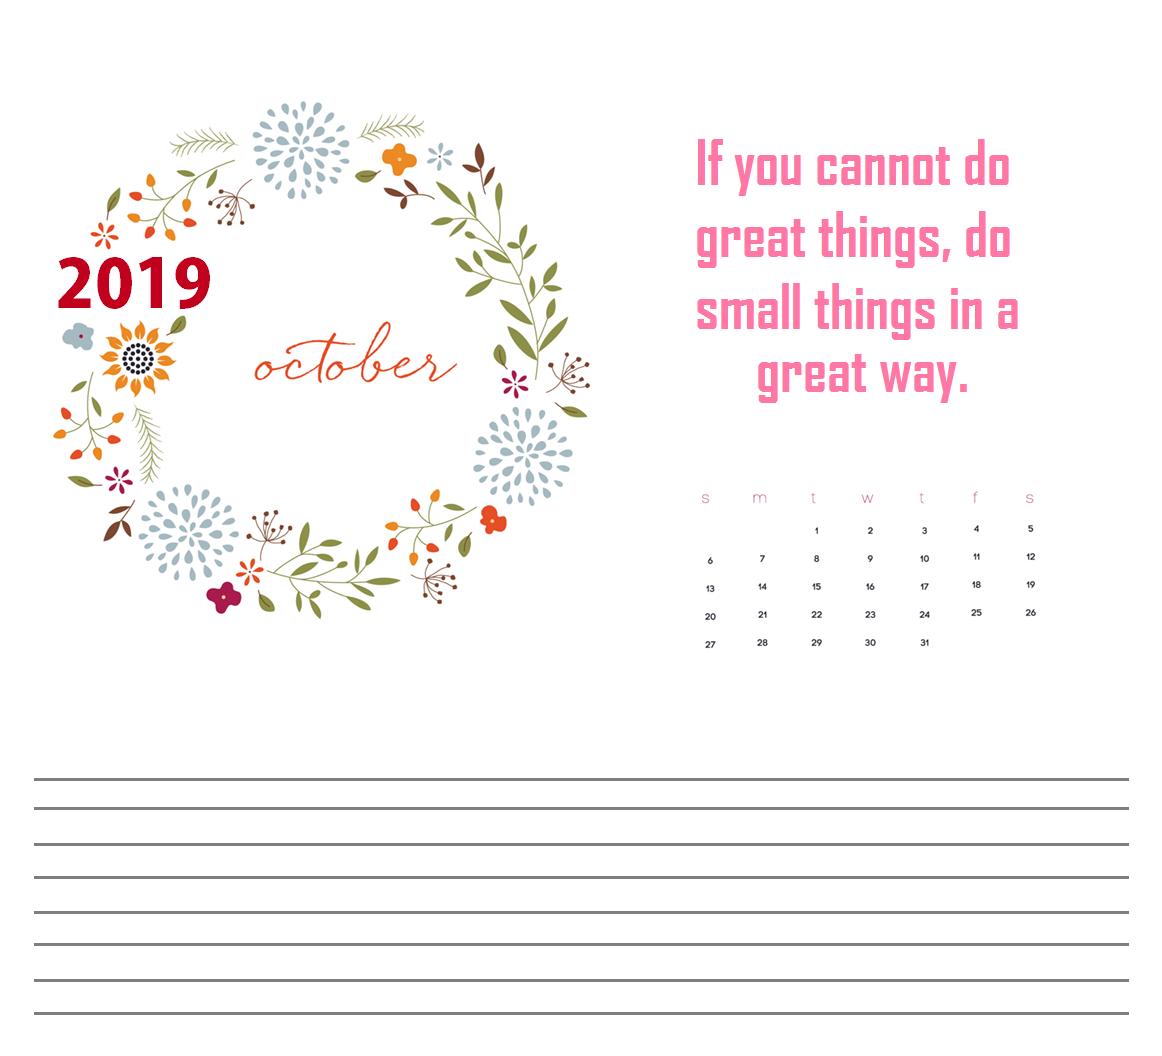 October 2019 Quotes Calendar For Desk